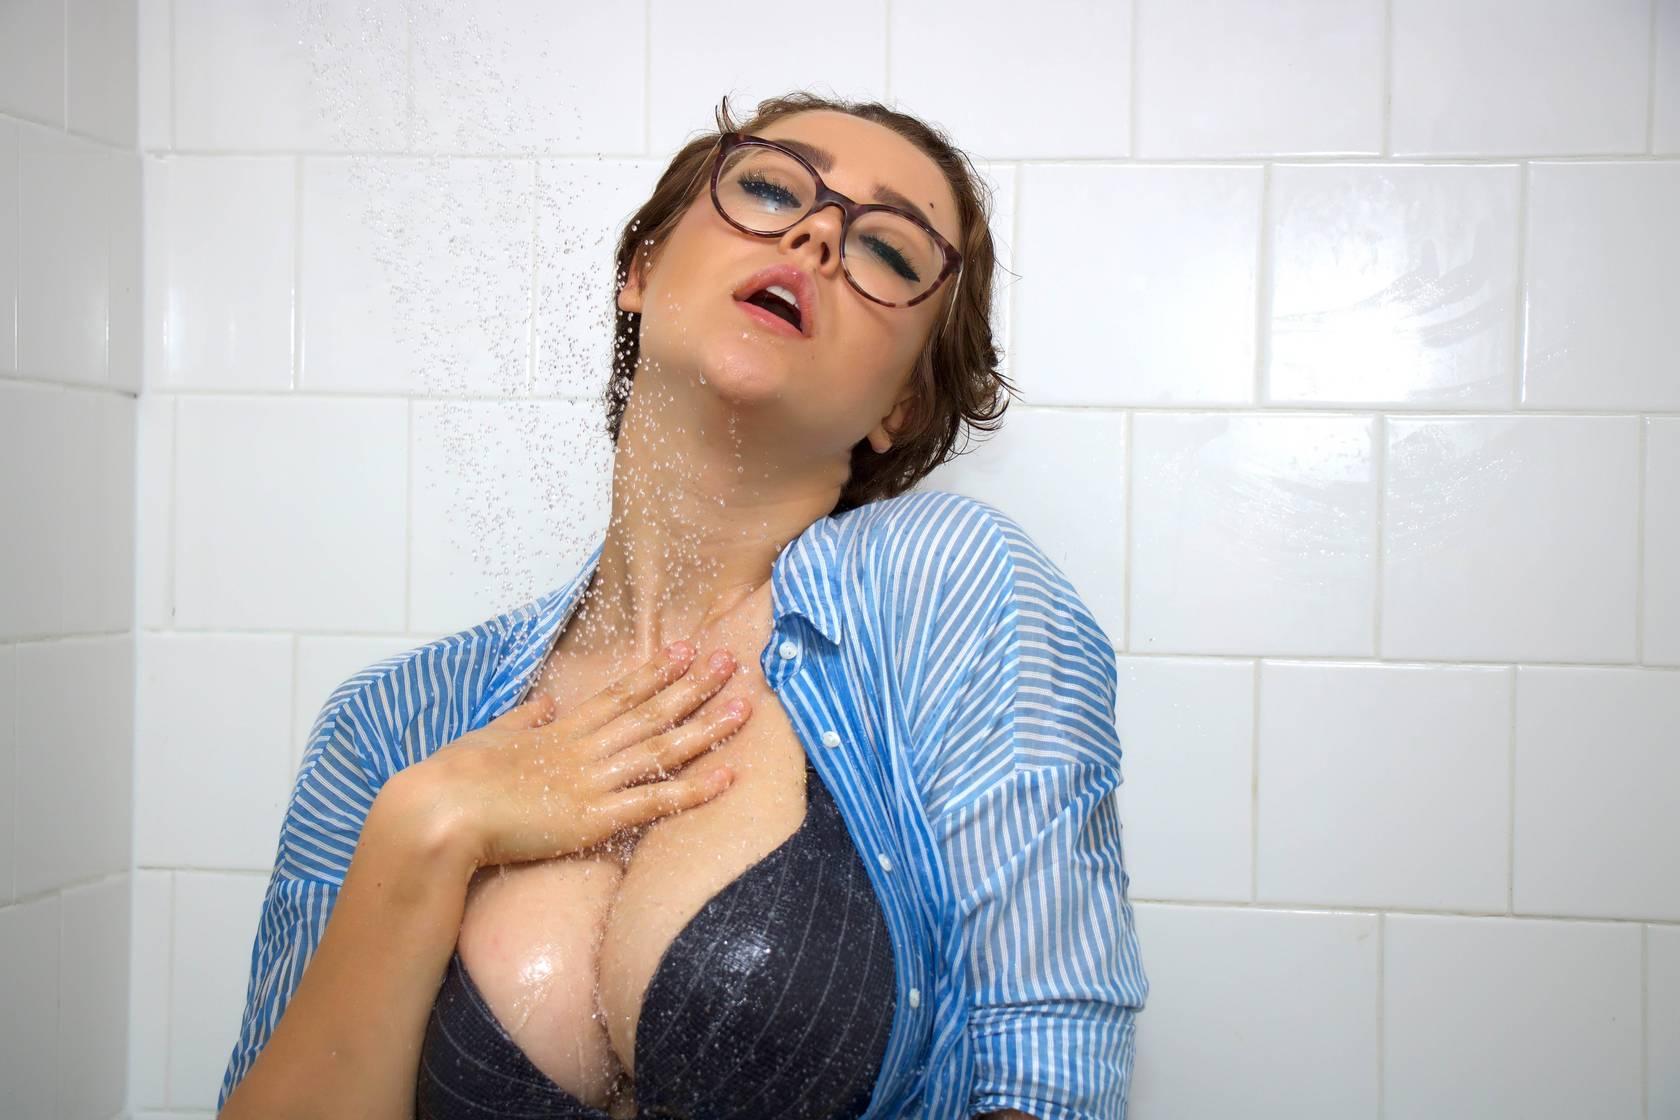 Sabrina nichole onlyfans pussy tease photo